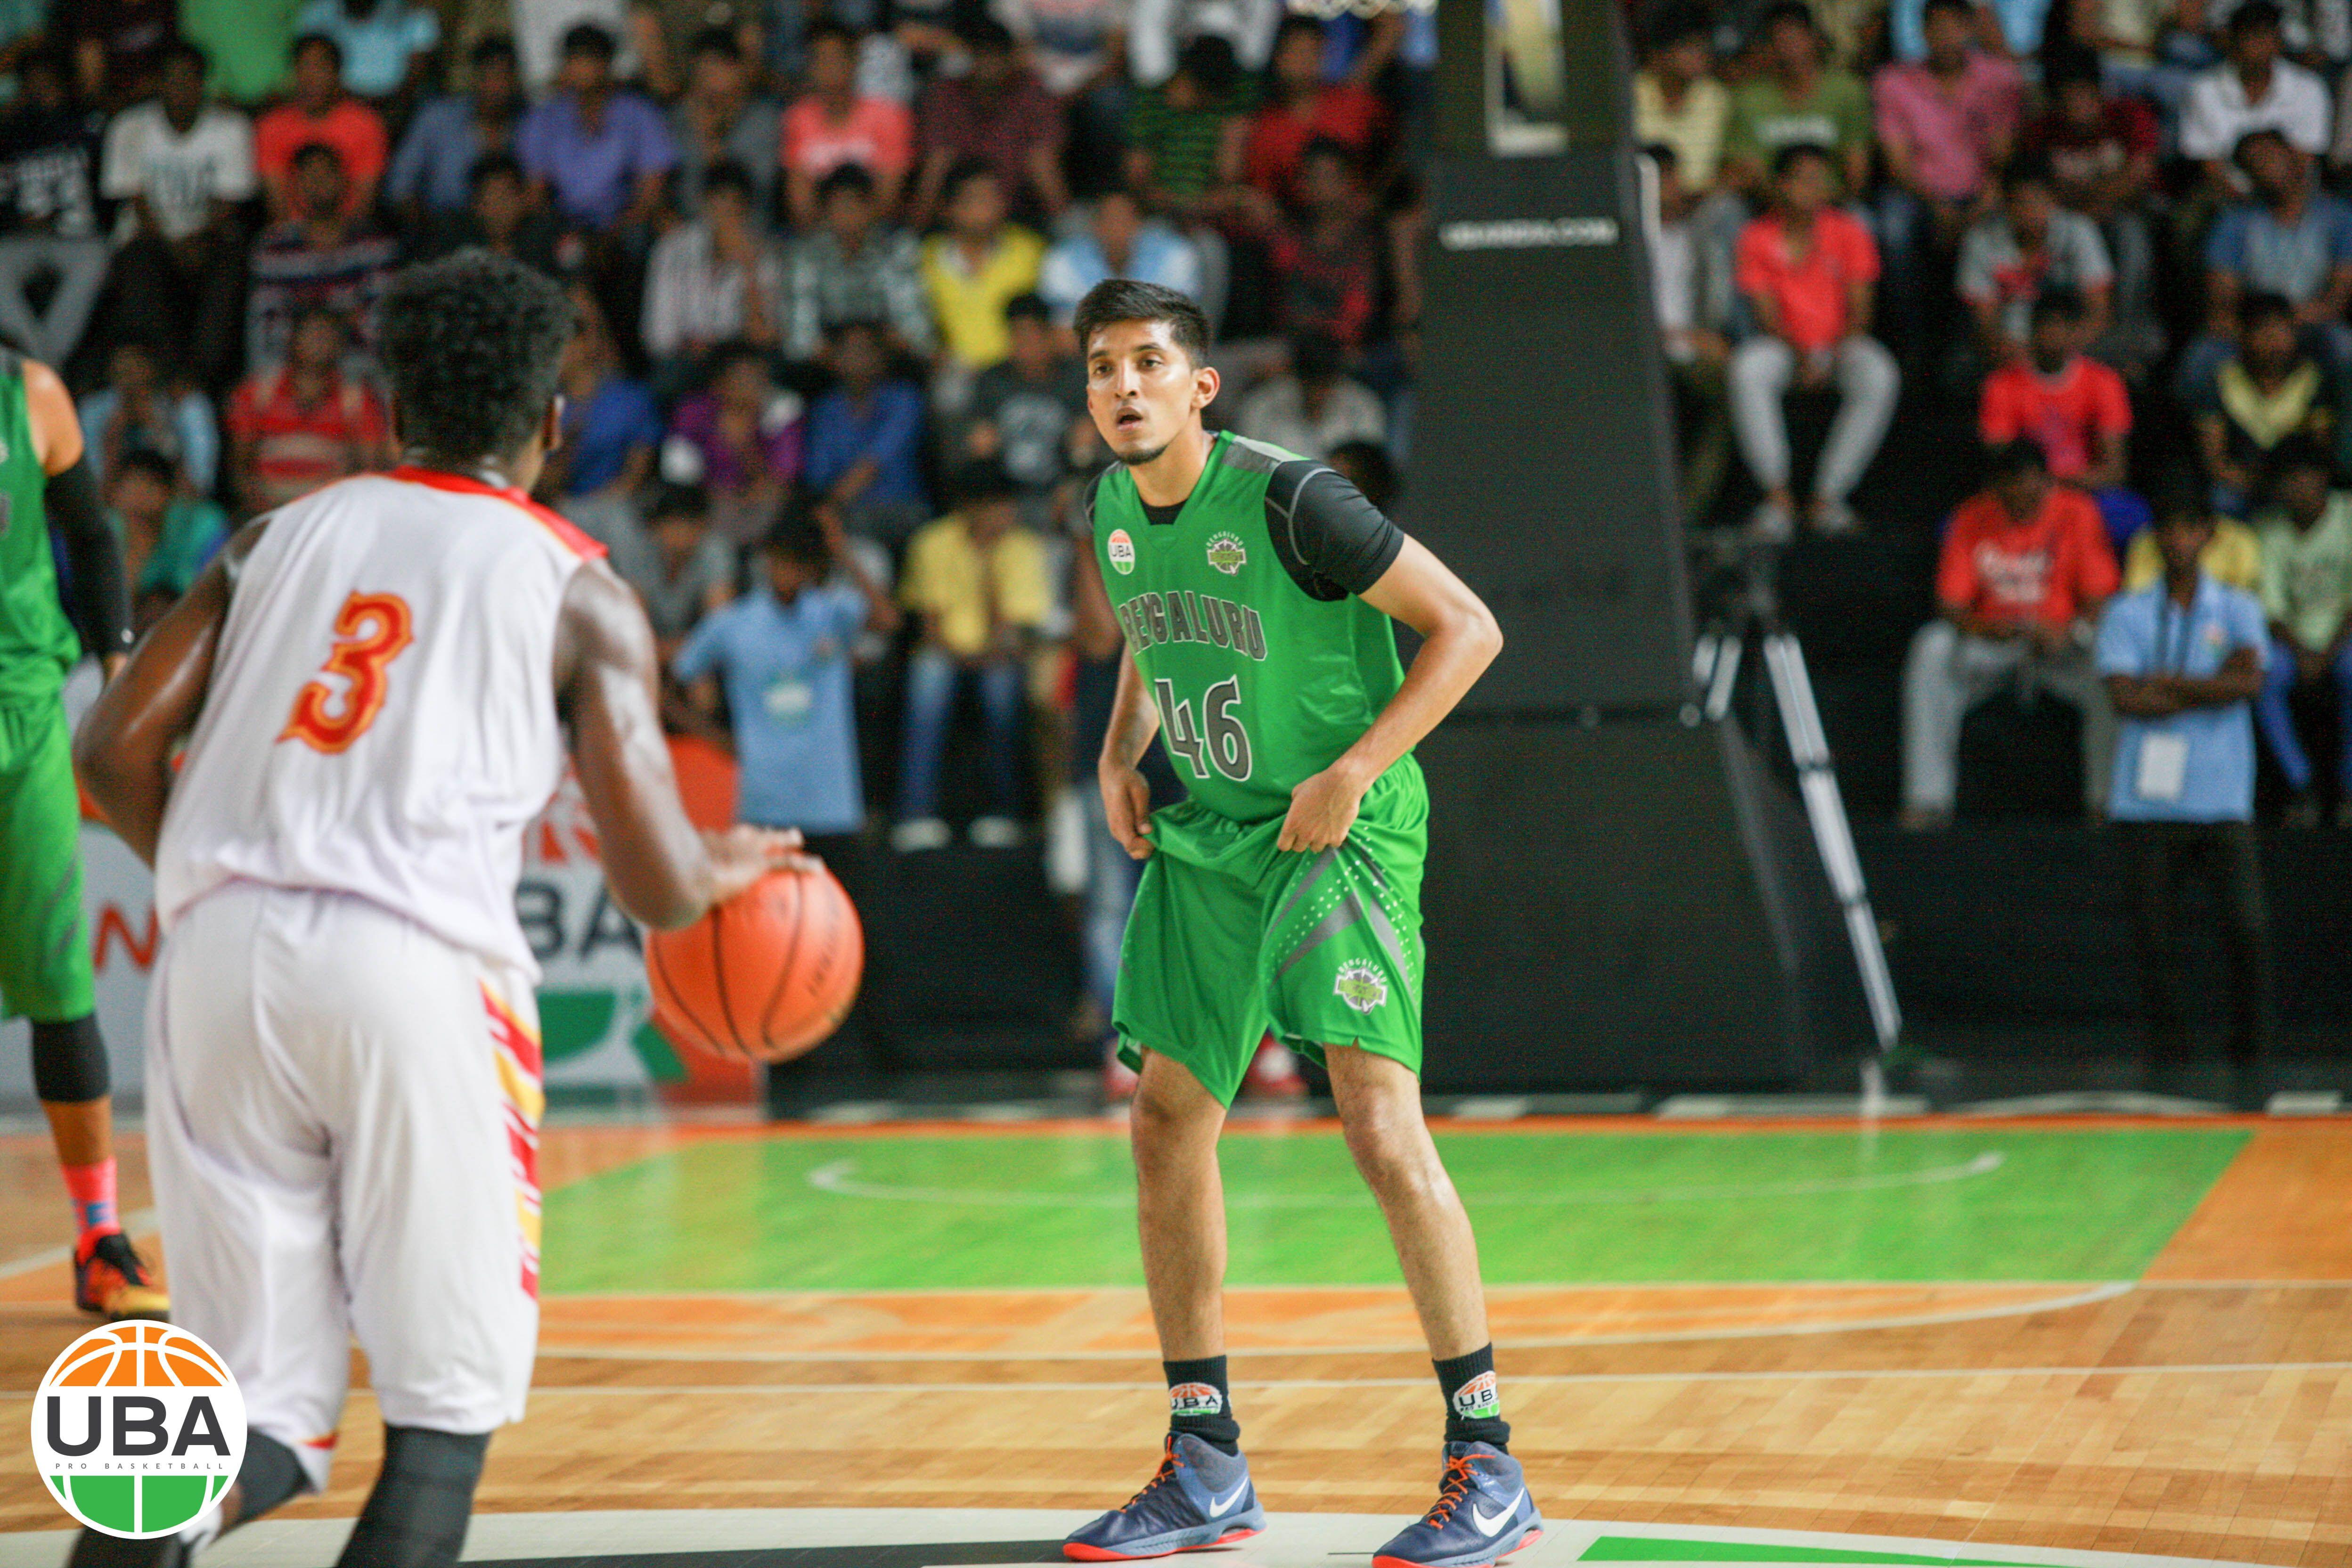 Kaif Zia Getting Into His Tenacious Defensive Stance Vs Pune Peshwas Ubaindia Ubaseason4 Basketball Teams Basketball Court Basketball